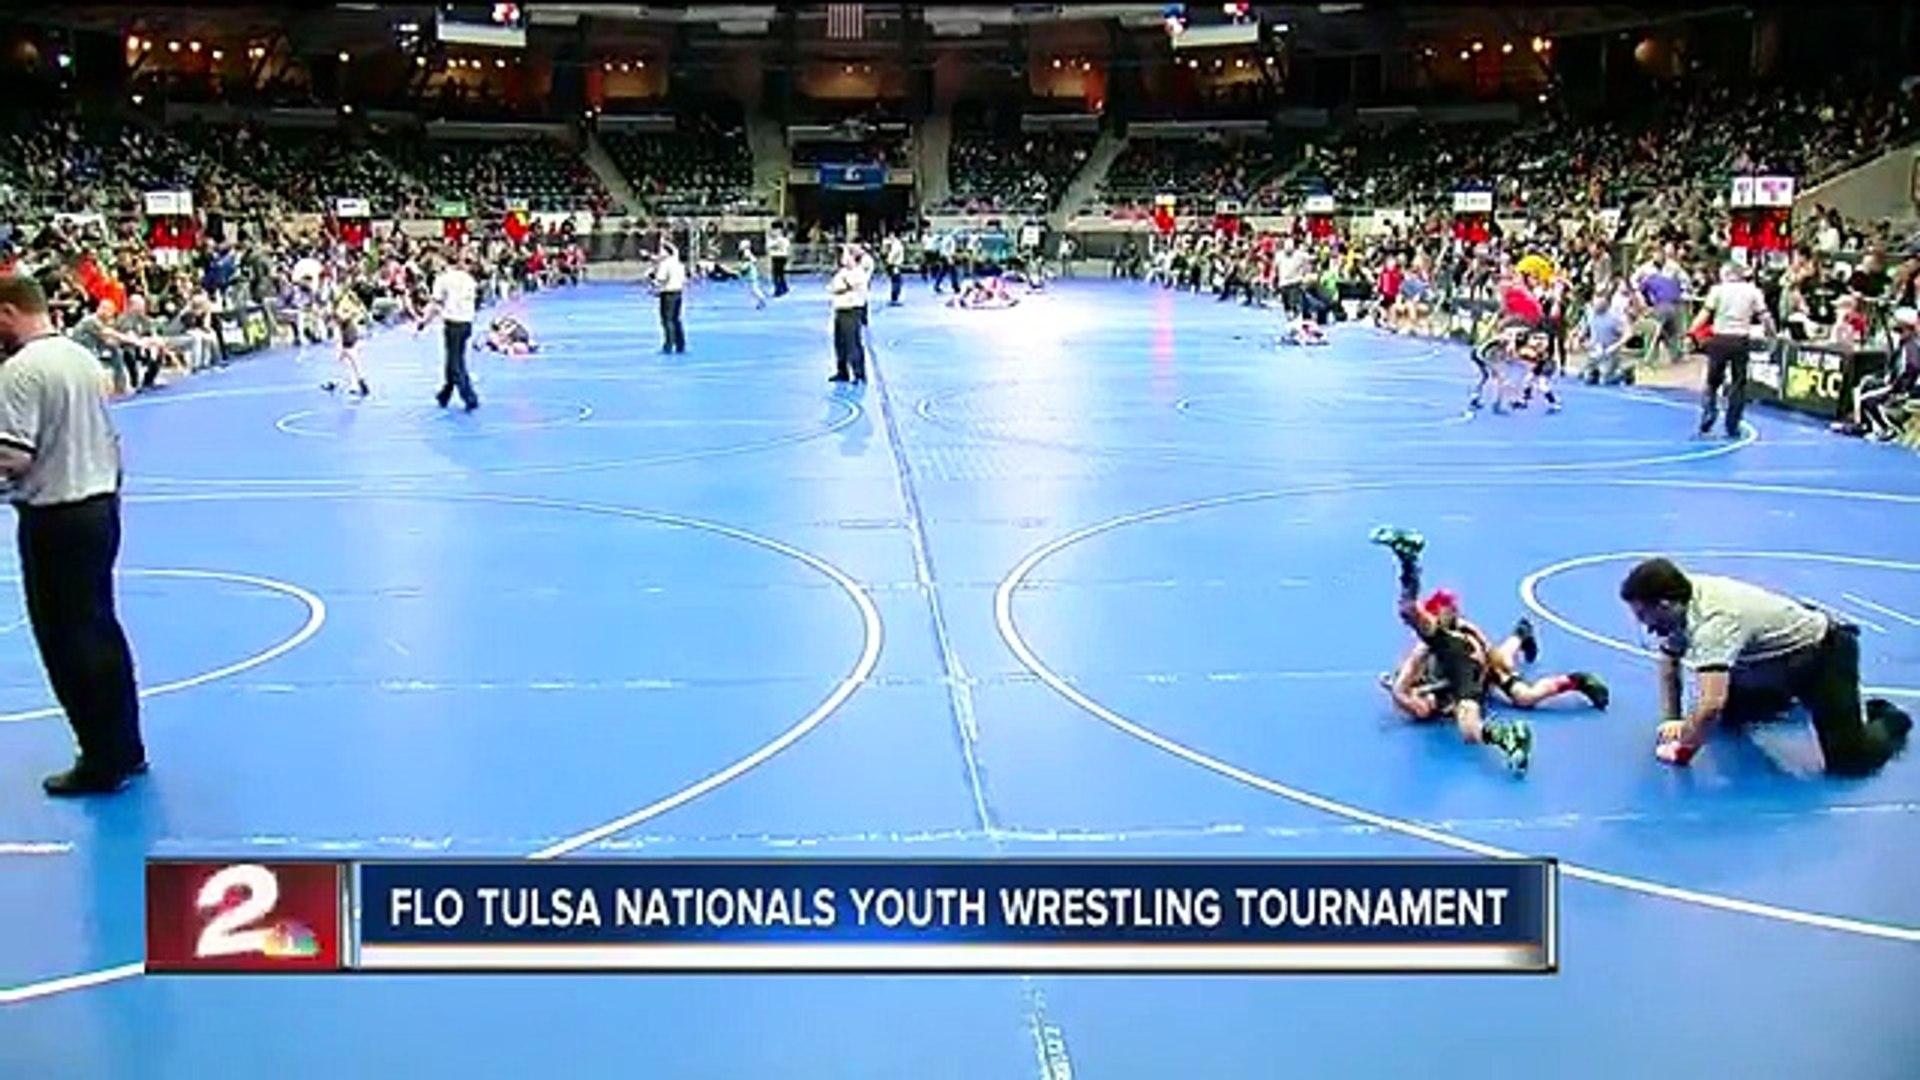 FLO Tulsa Nationals Youth Wrestling Tournament